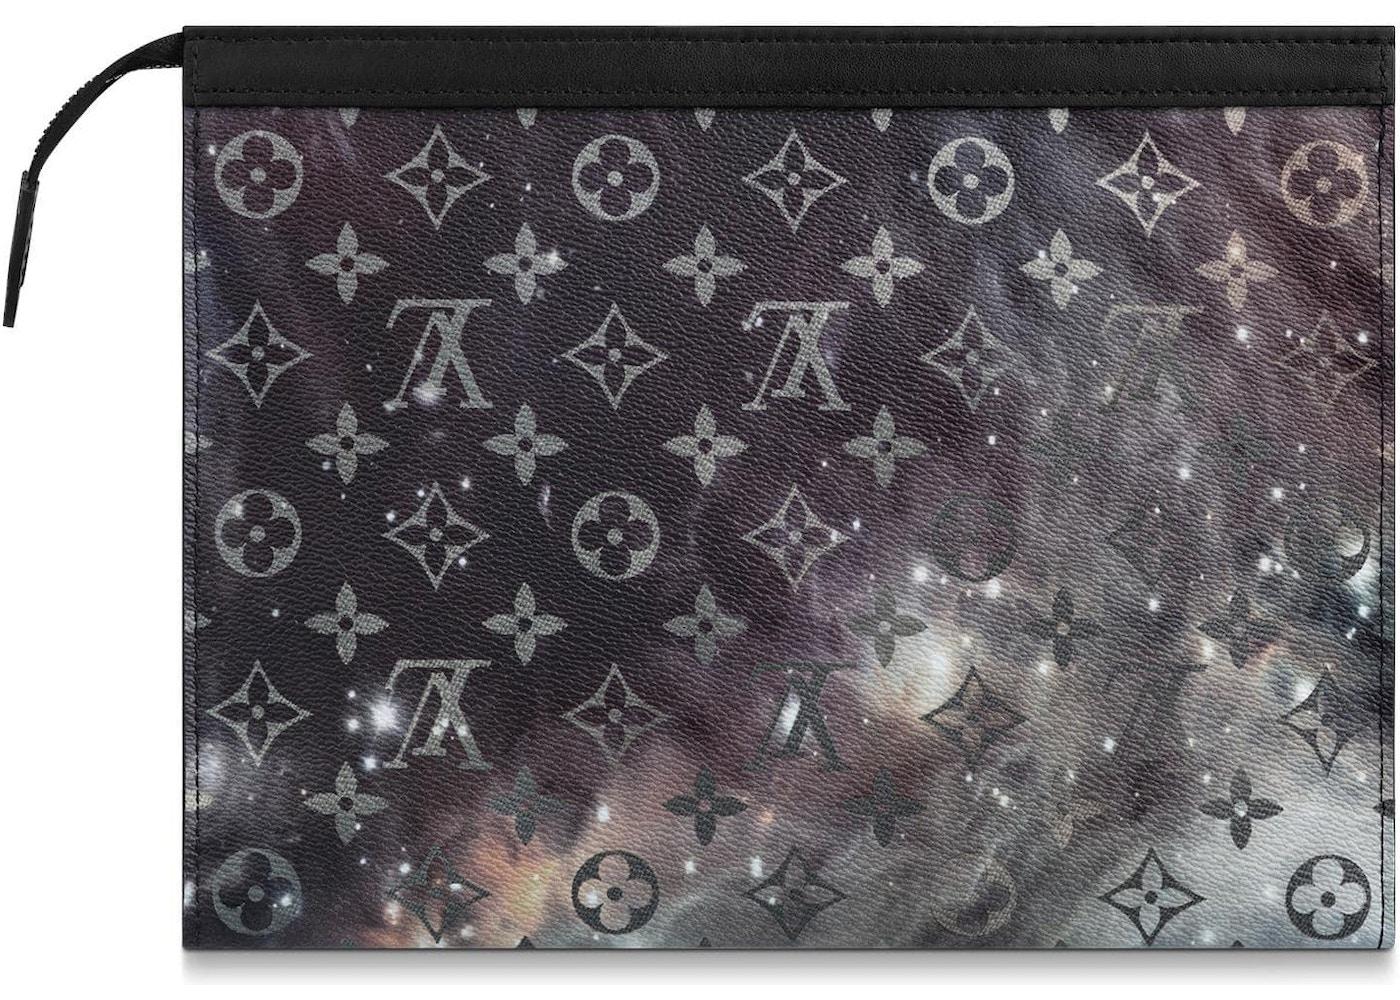 ab56e9bb944f6 Buy & Sell Louis Vuitton Collectors Handbags